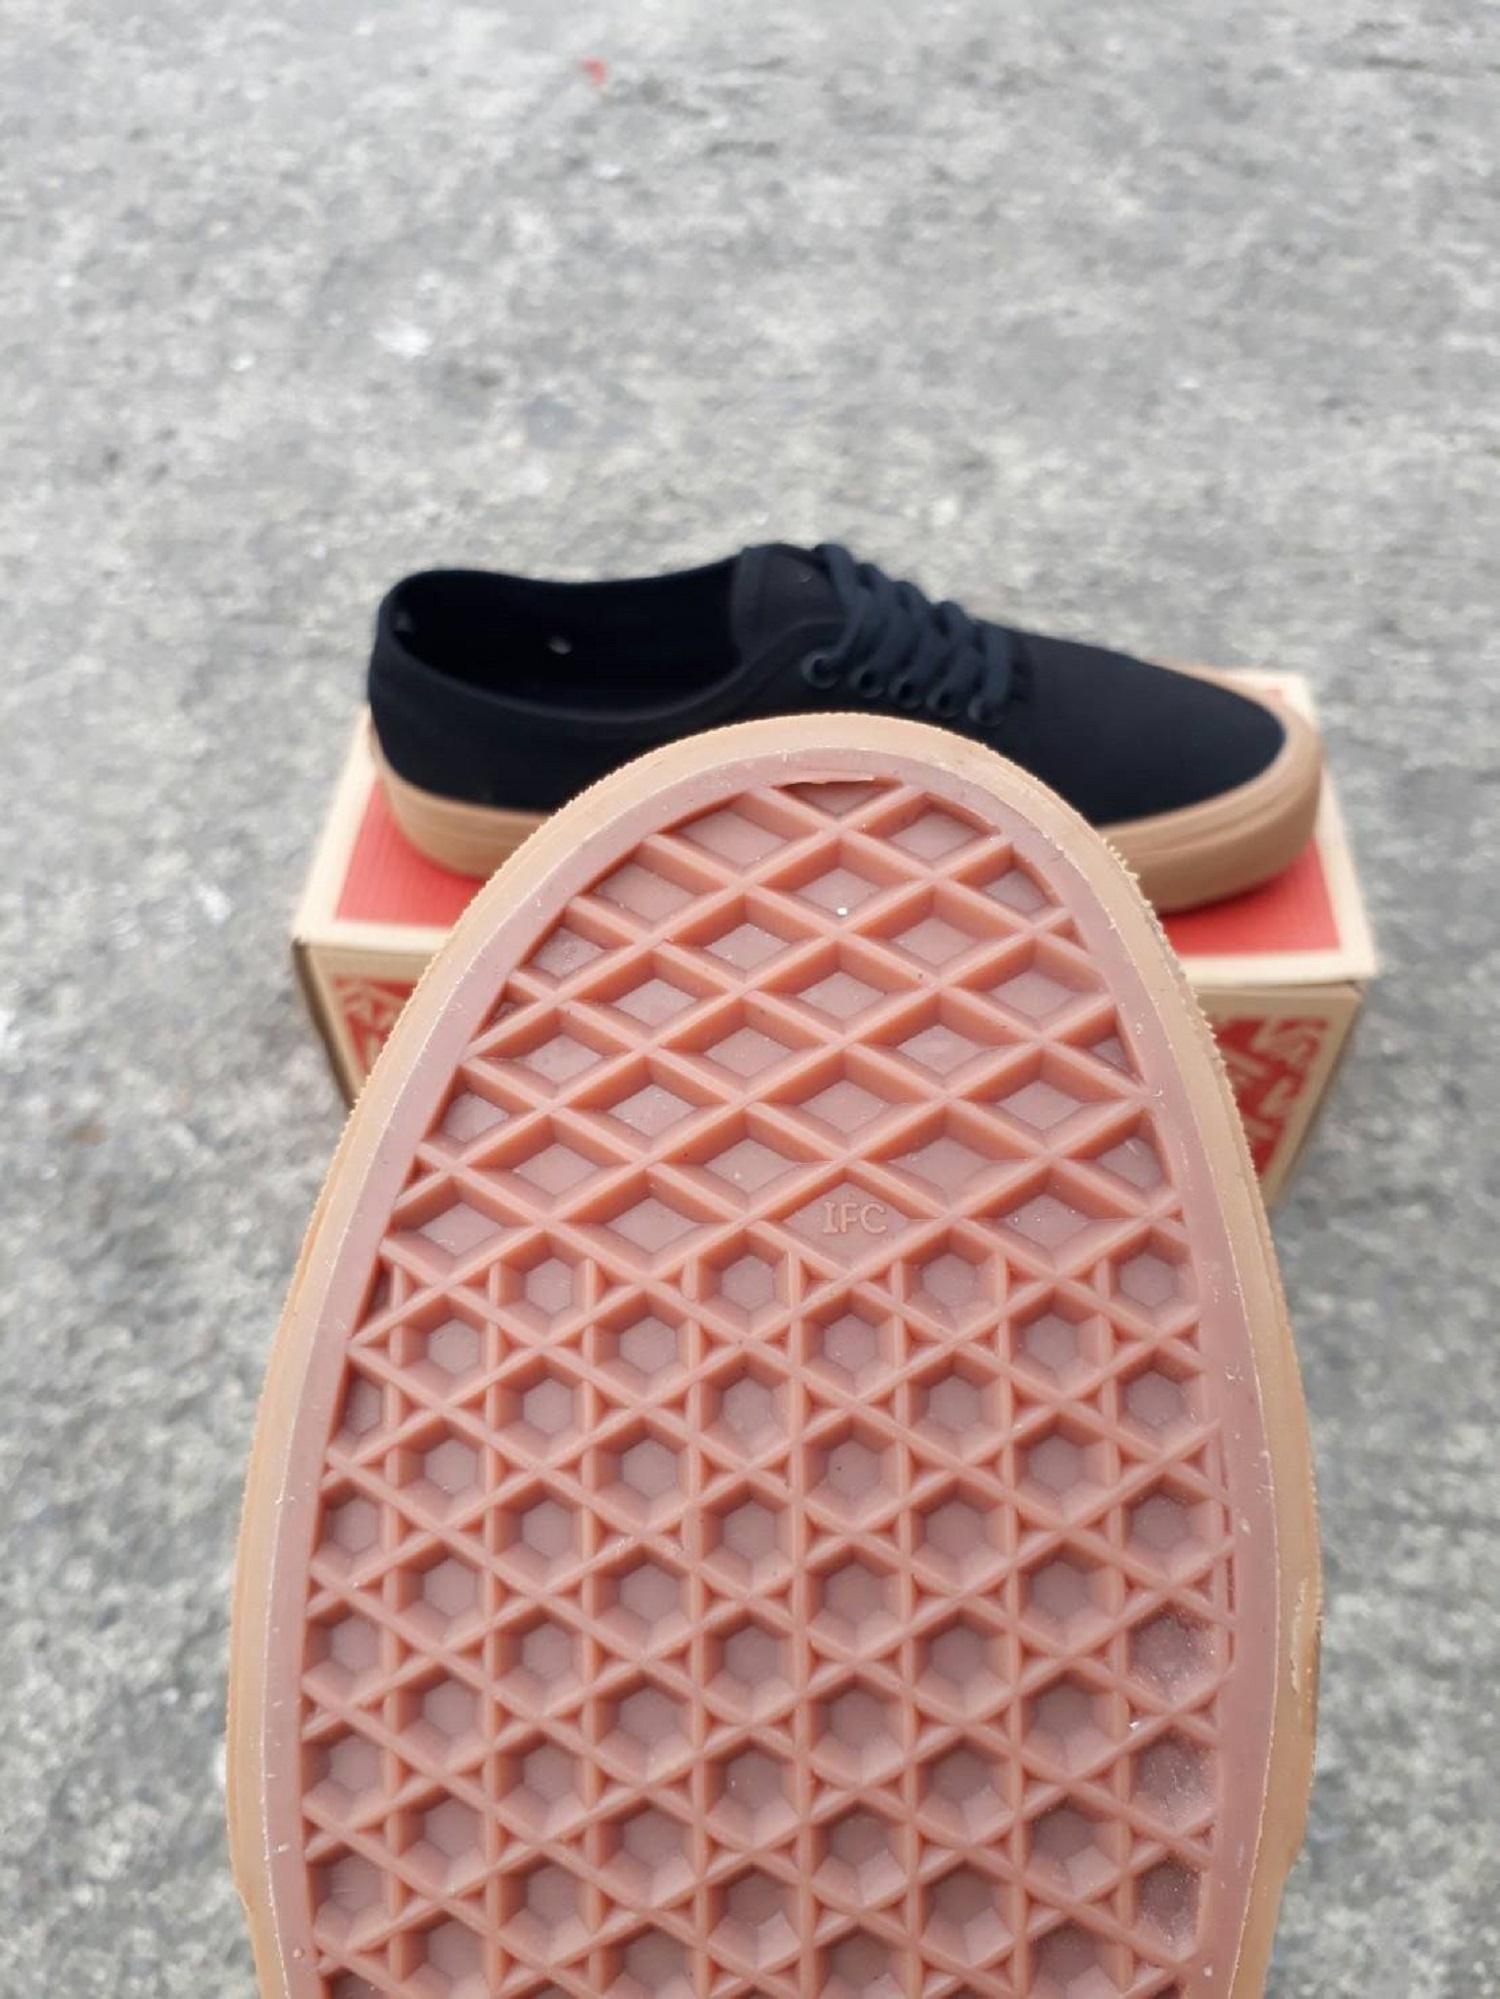 Sepatu Vans Authentic Maroon Gum Wafle Ifc - Daftar Harga Terlengkap ... f2e10b9ce4